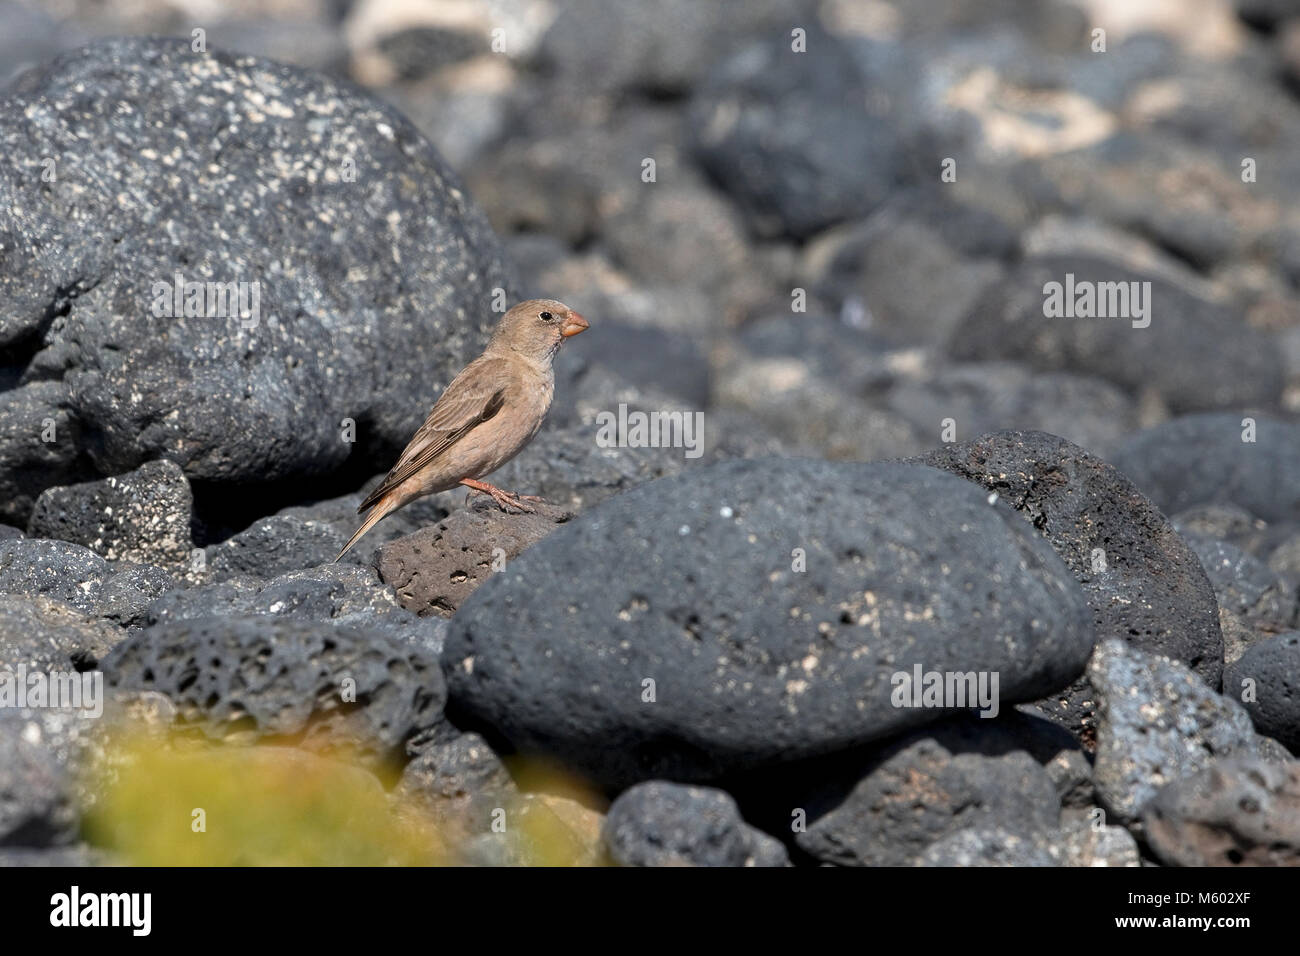 Trumpeter Finch (Bucanetes githagineus amantum) - Stock Image